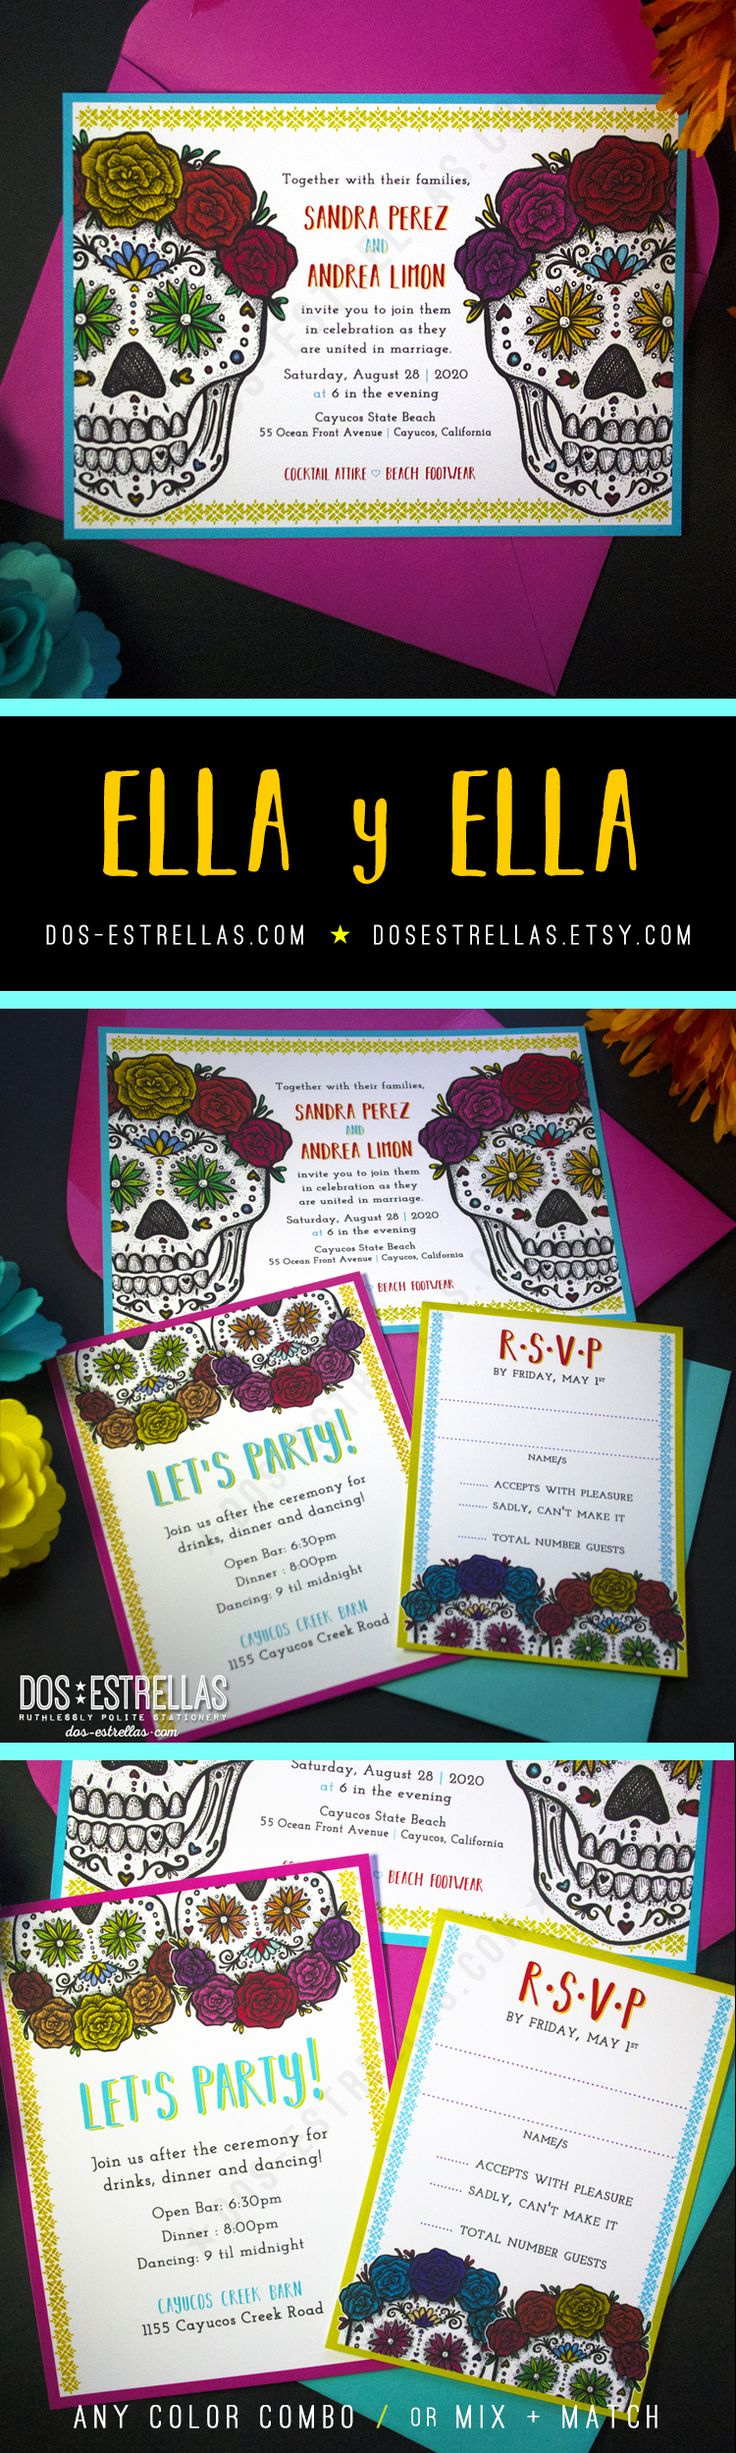 13 Best Wedding Invitations By Dos Estrellas Images On Pinterest